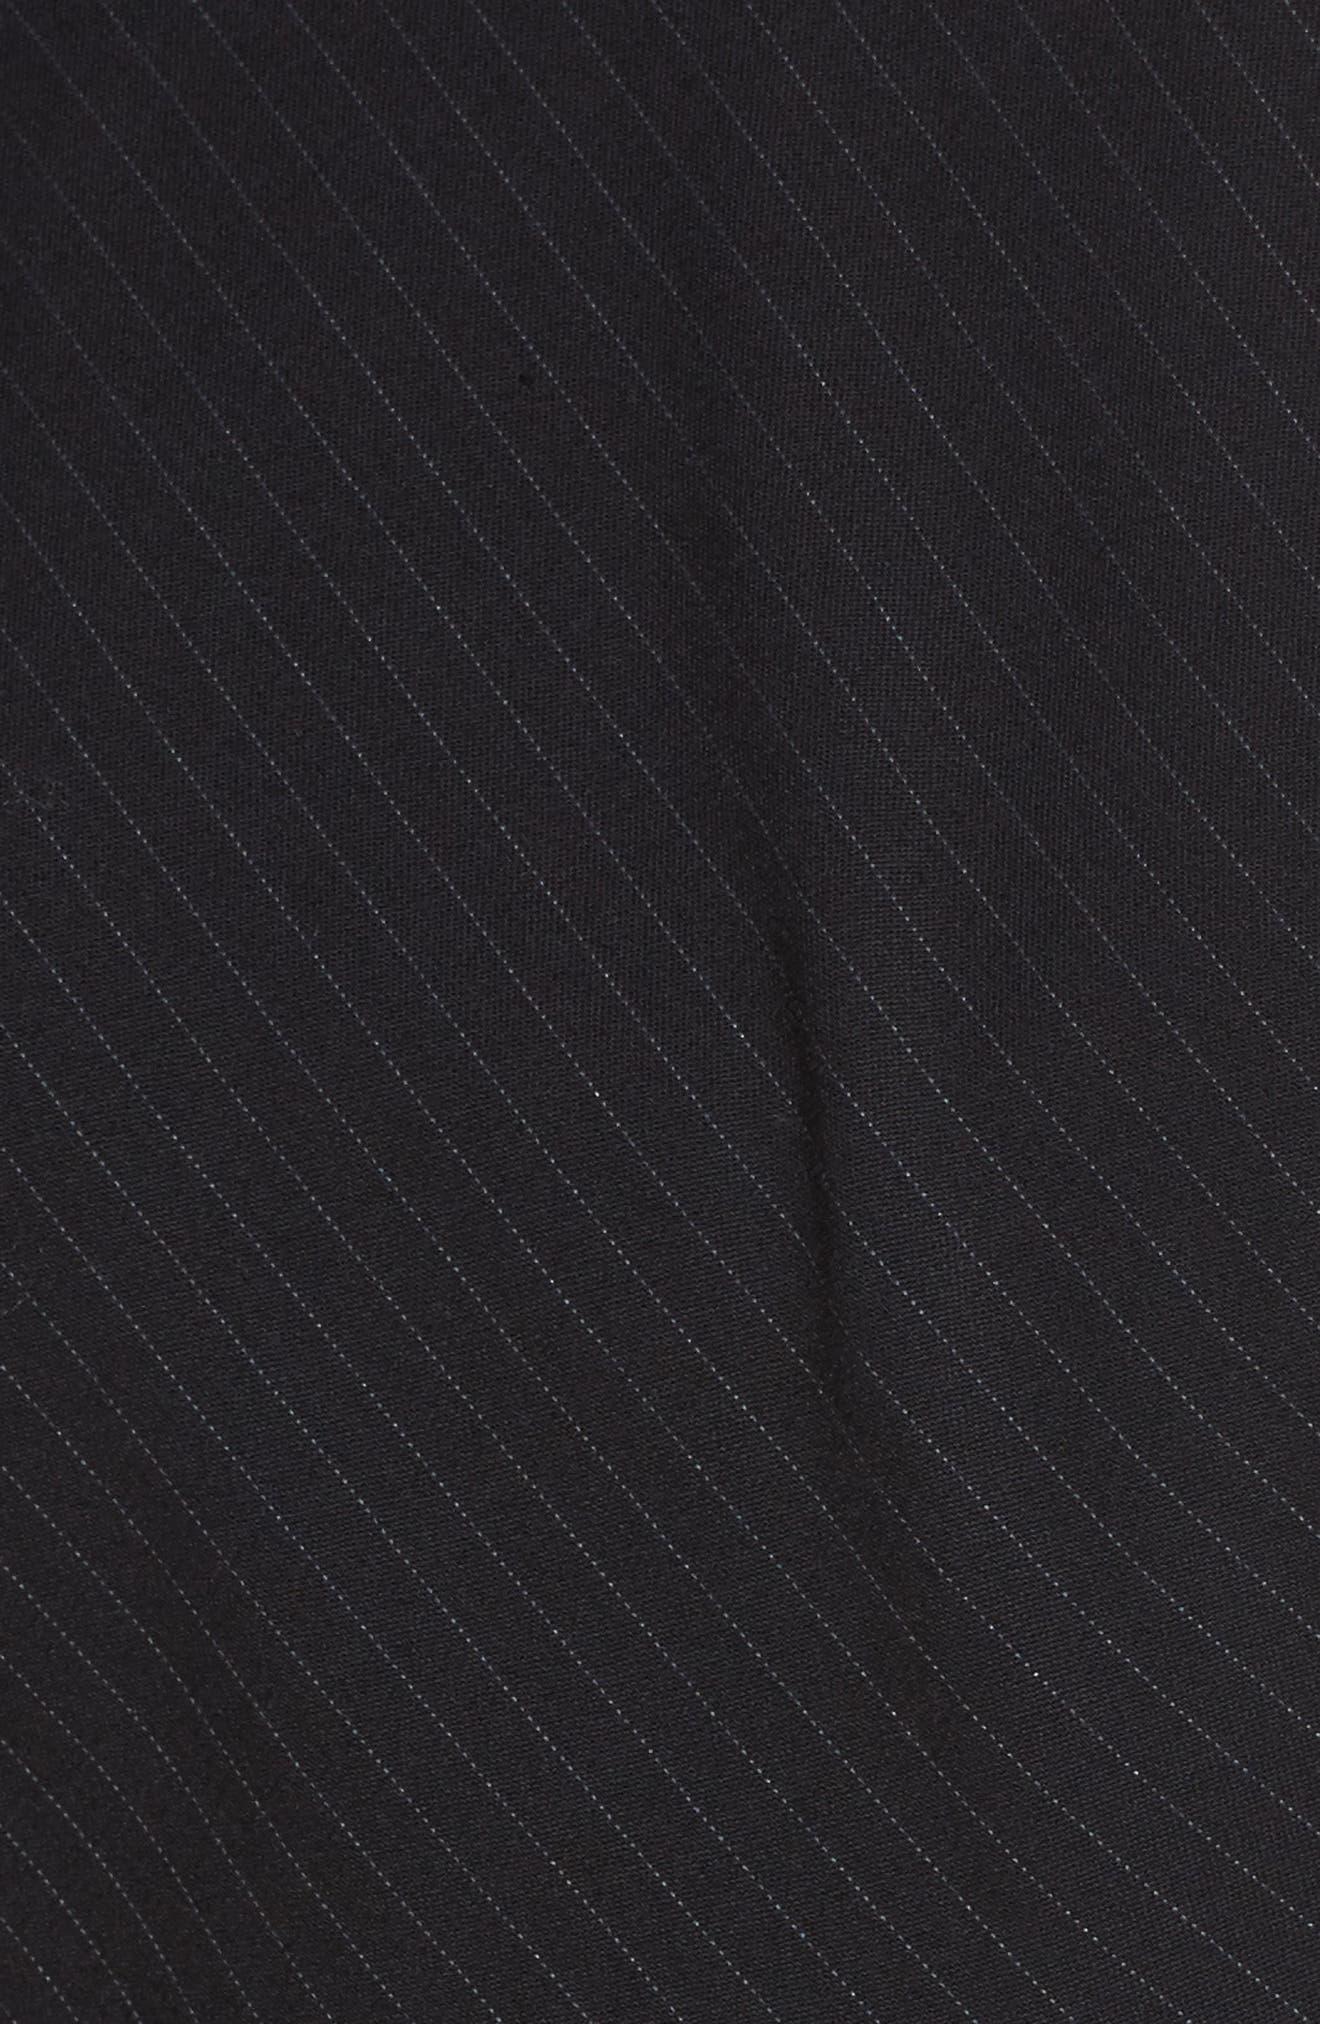 Bias Cut Pinstripe Jumper Dress,                             Alternate thumbnail 5, color,                             401